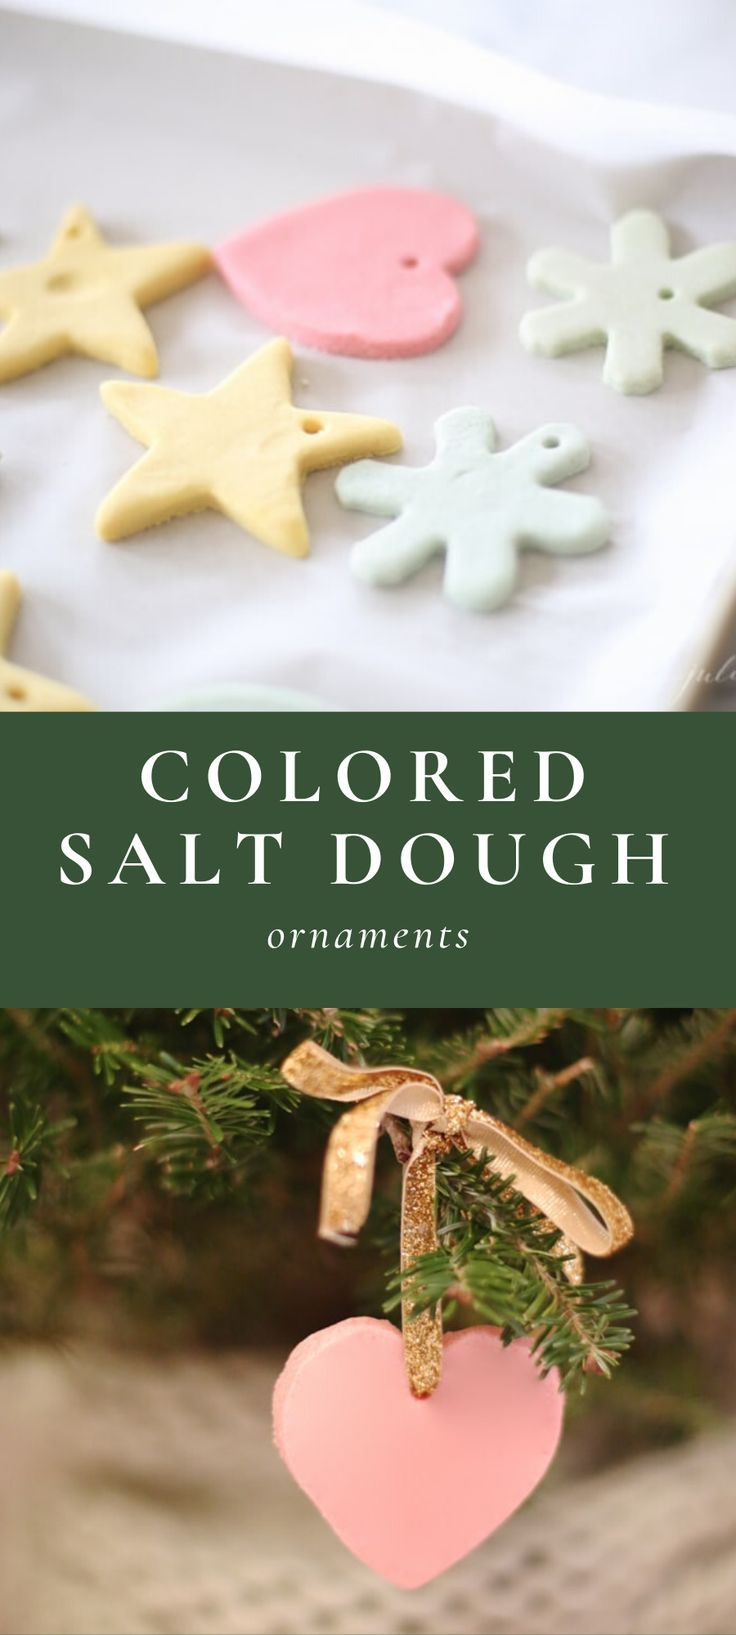 How to Make Color Salt Dough Ornaments